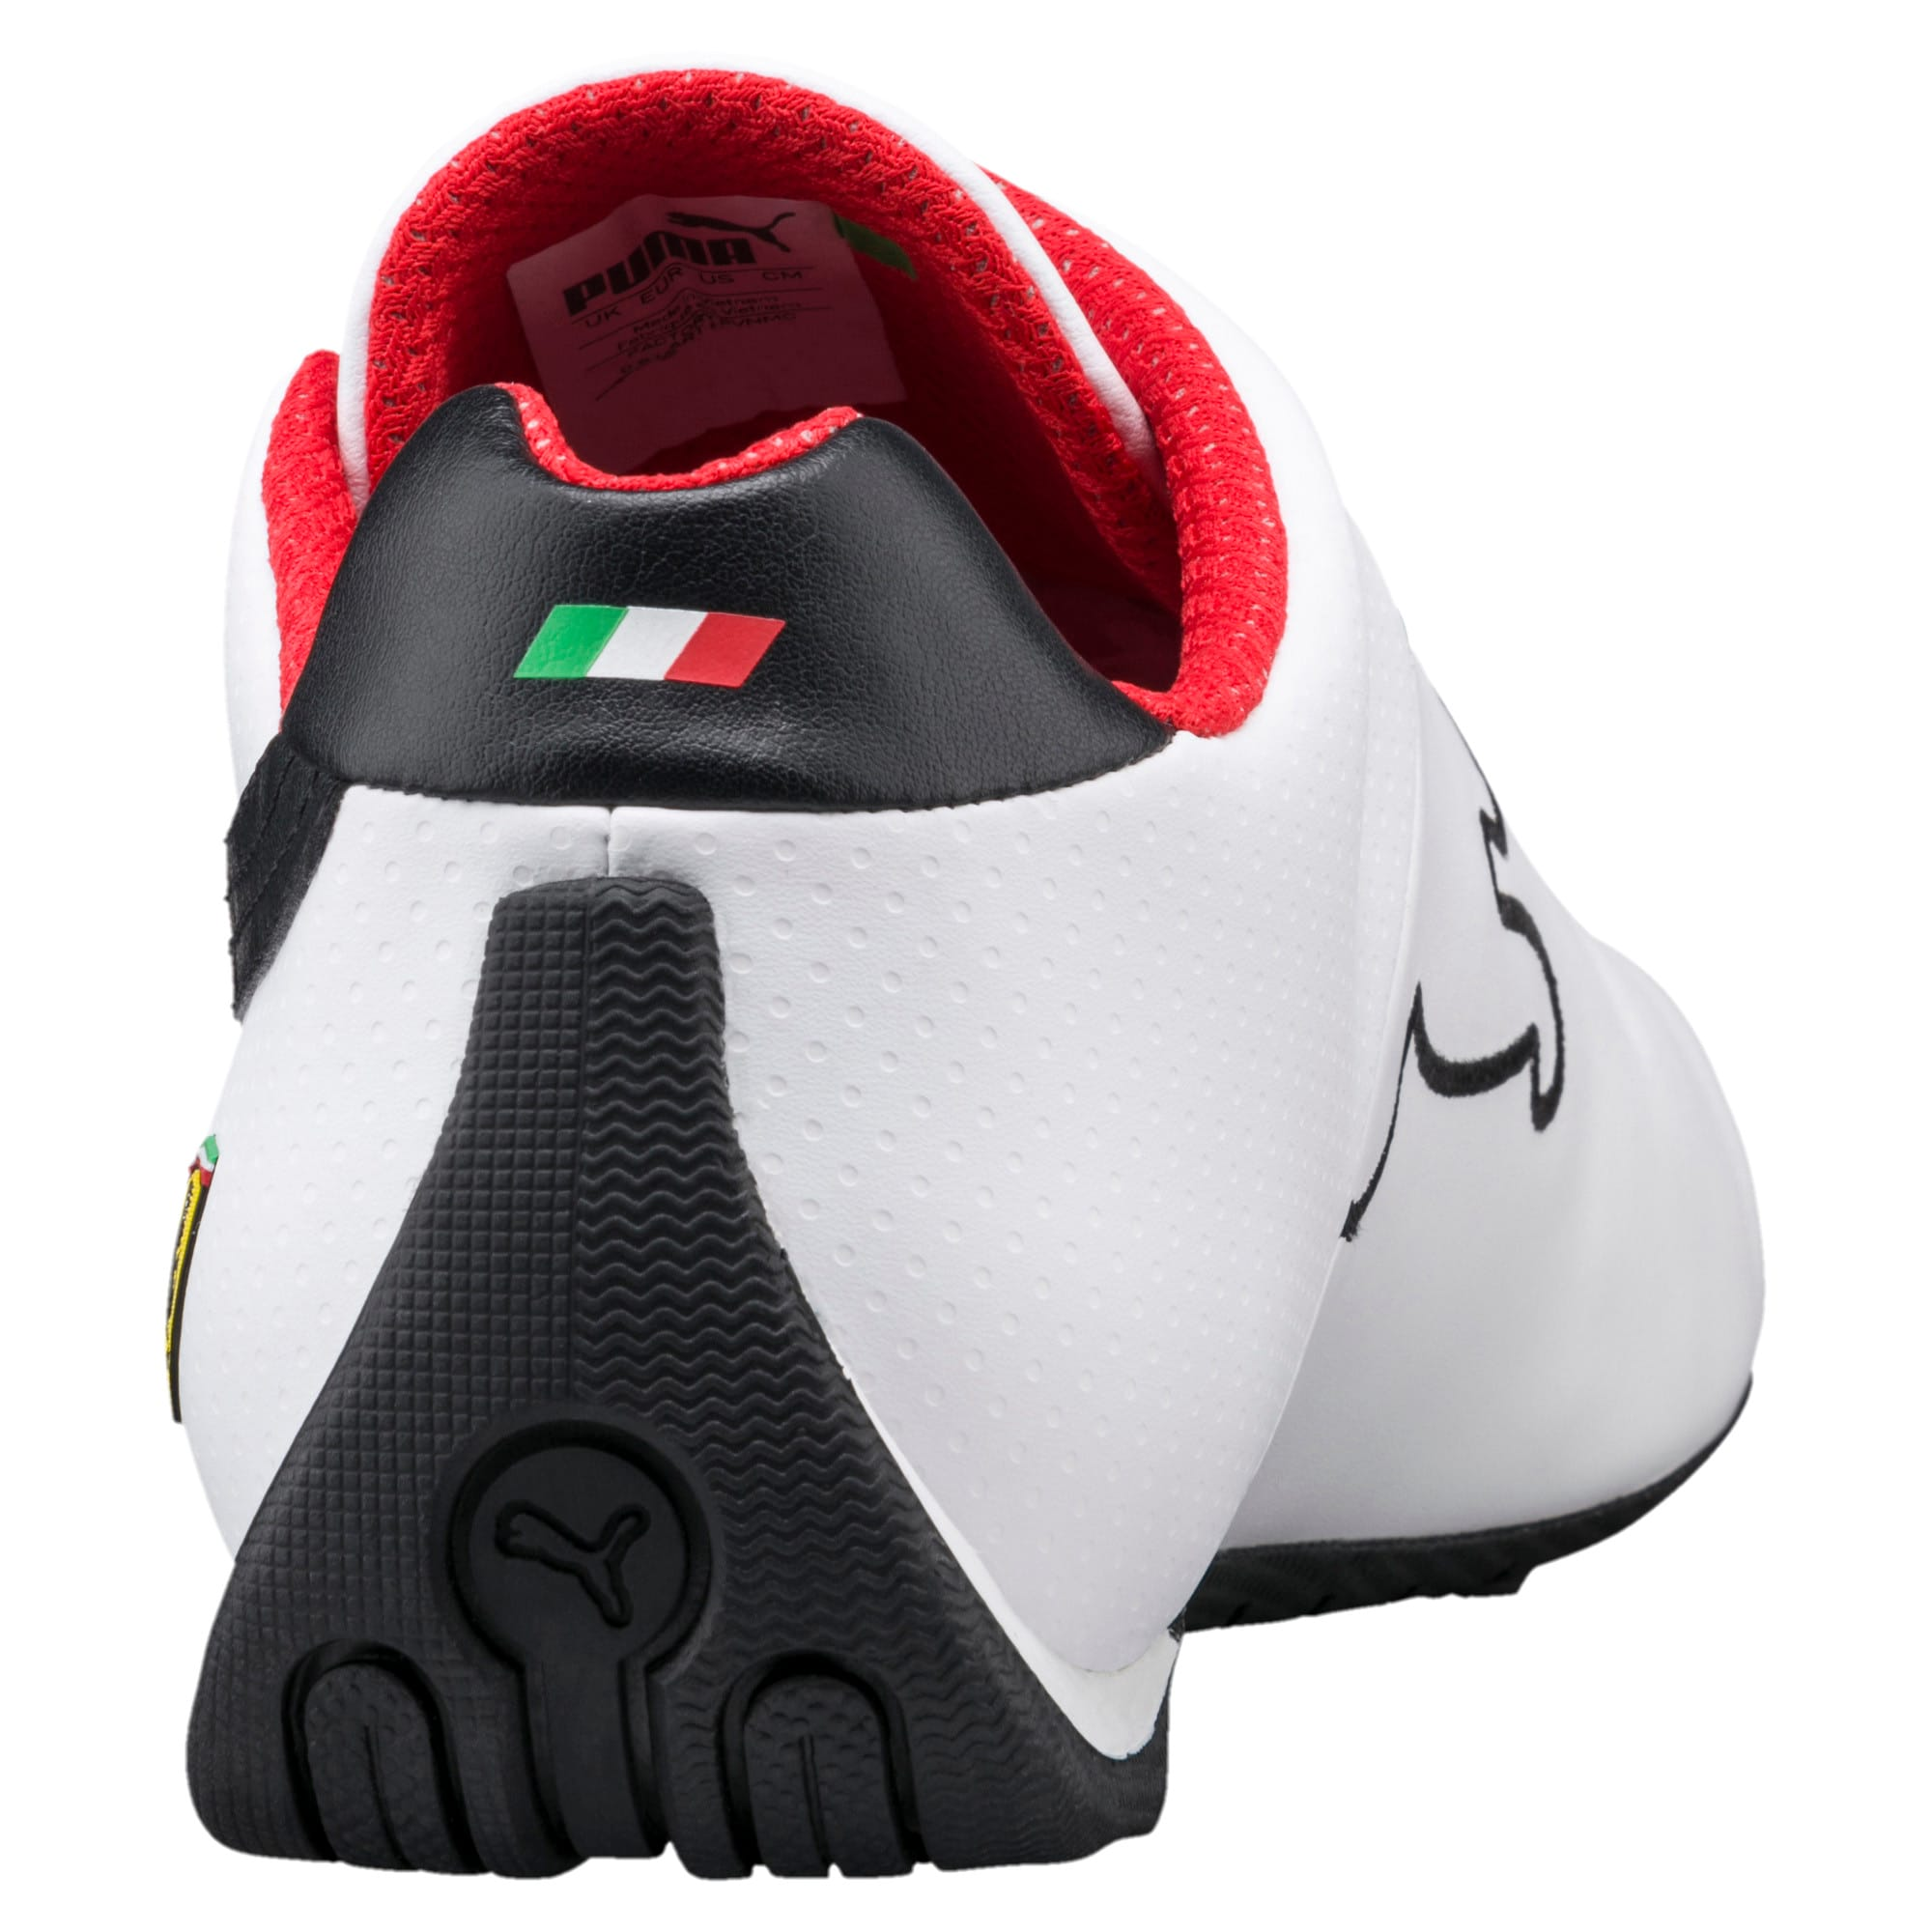 Thumbnail 4 of Ferrari Future Cat OG Trainers, White-Black-Rosso Corsa, medium